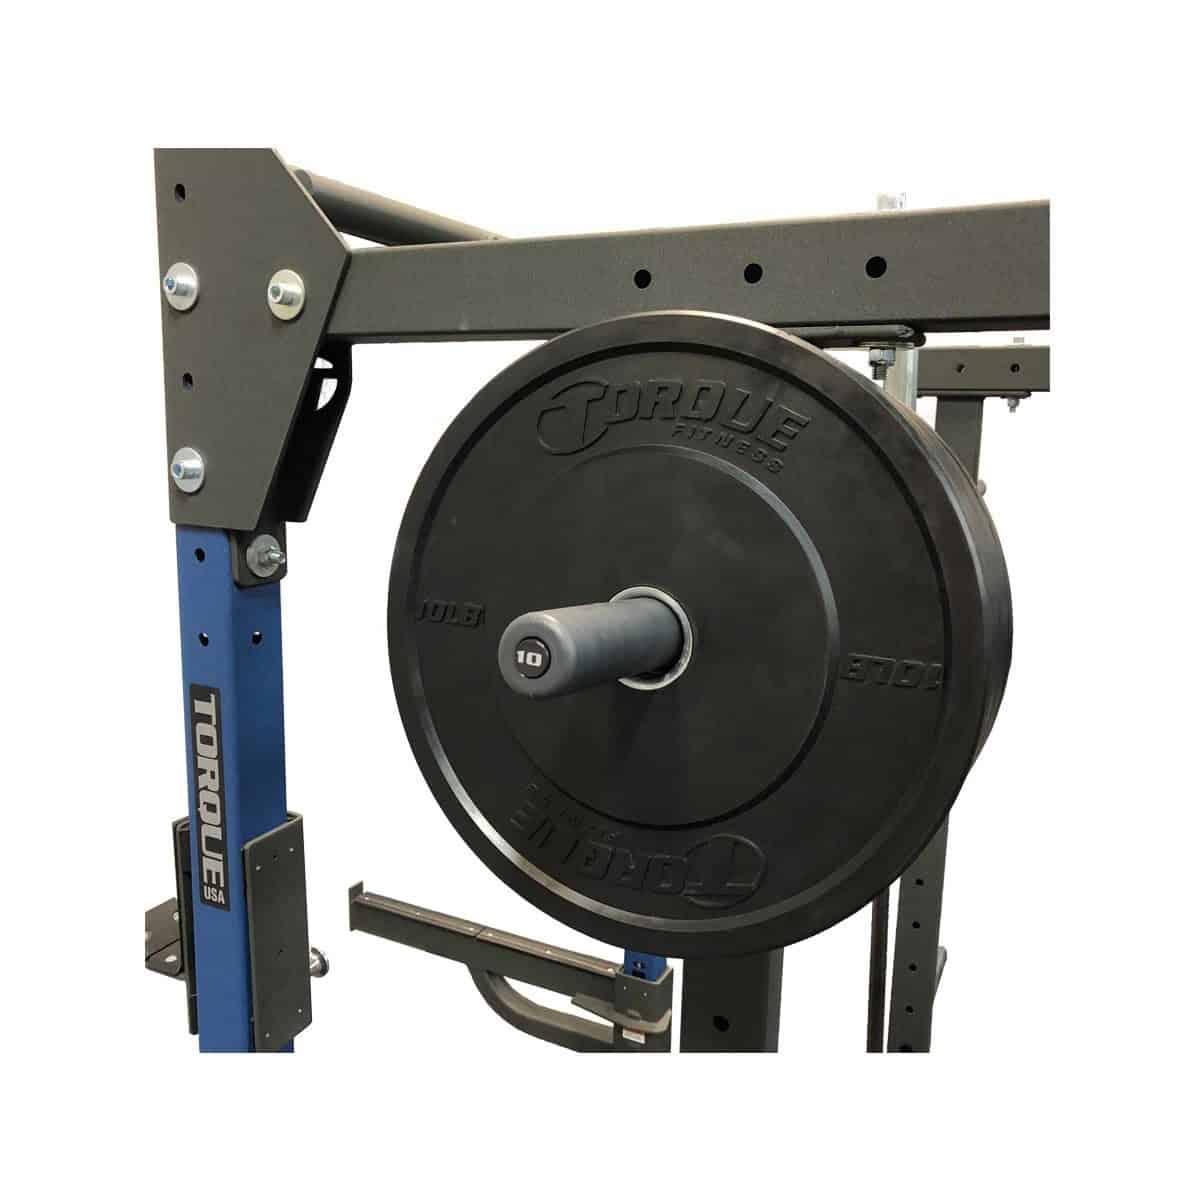 Weight Storage Numbering Kit 10-45 Lb